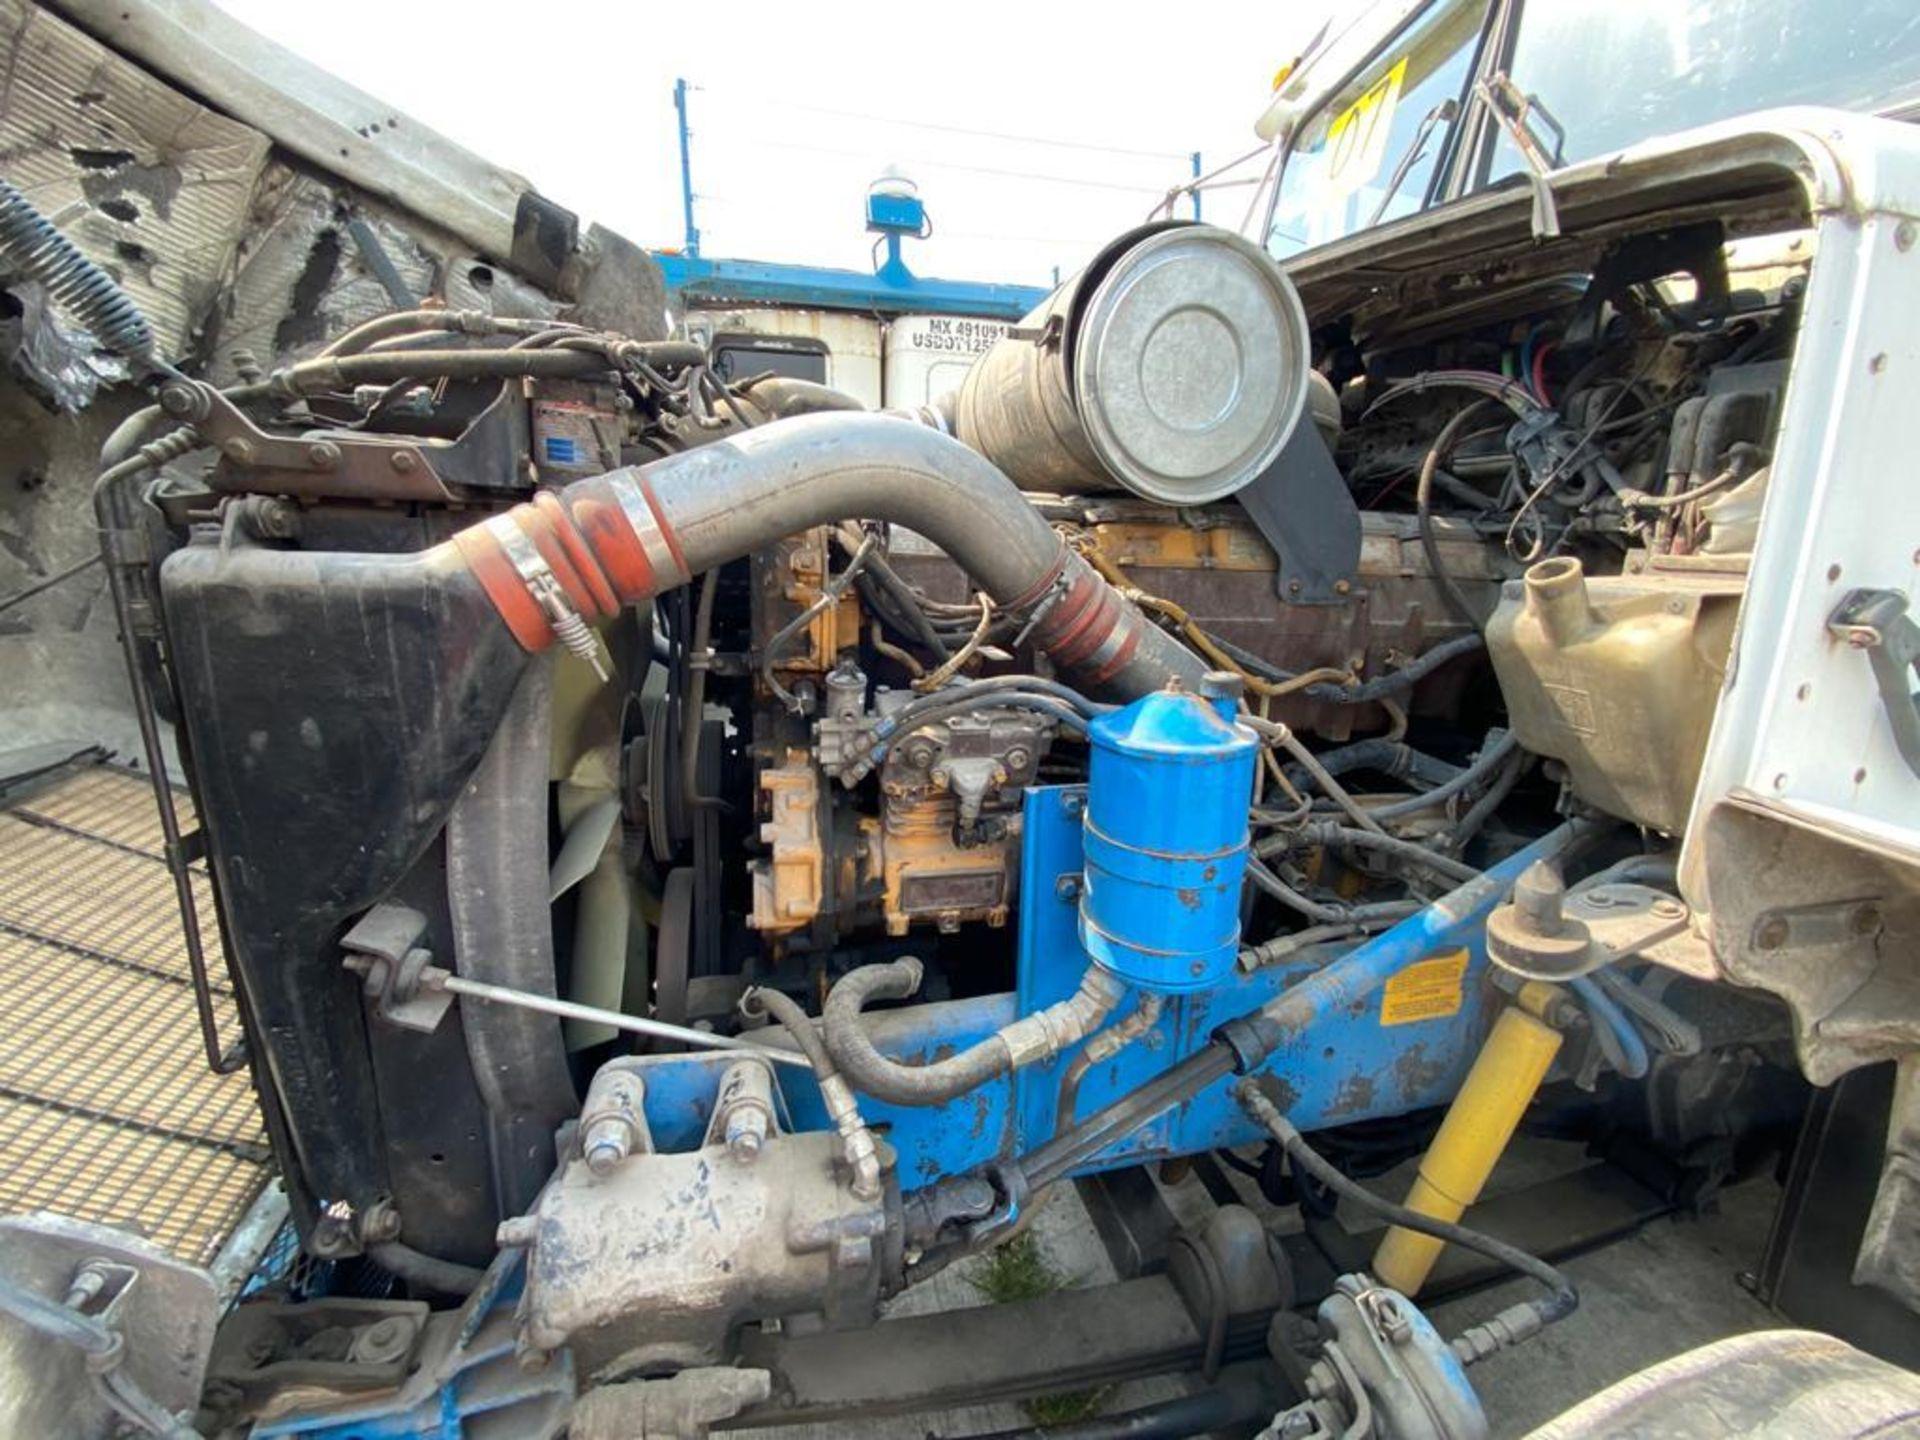 1999 Kenworth Sleeper truck tractor, standard transmission of 18 speeds - Image 56 of 72